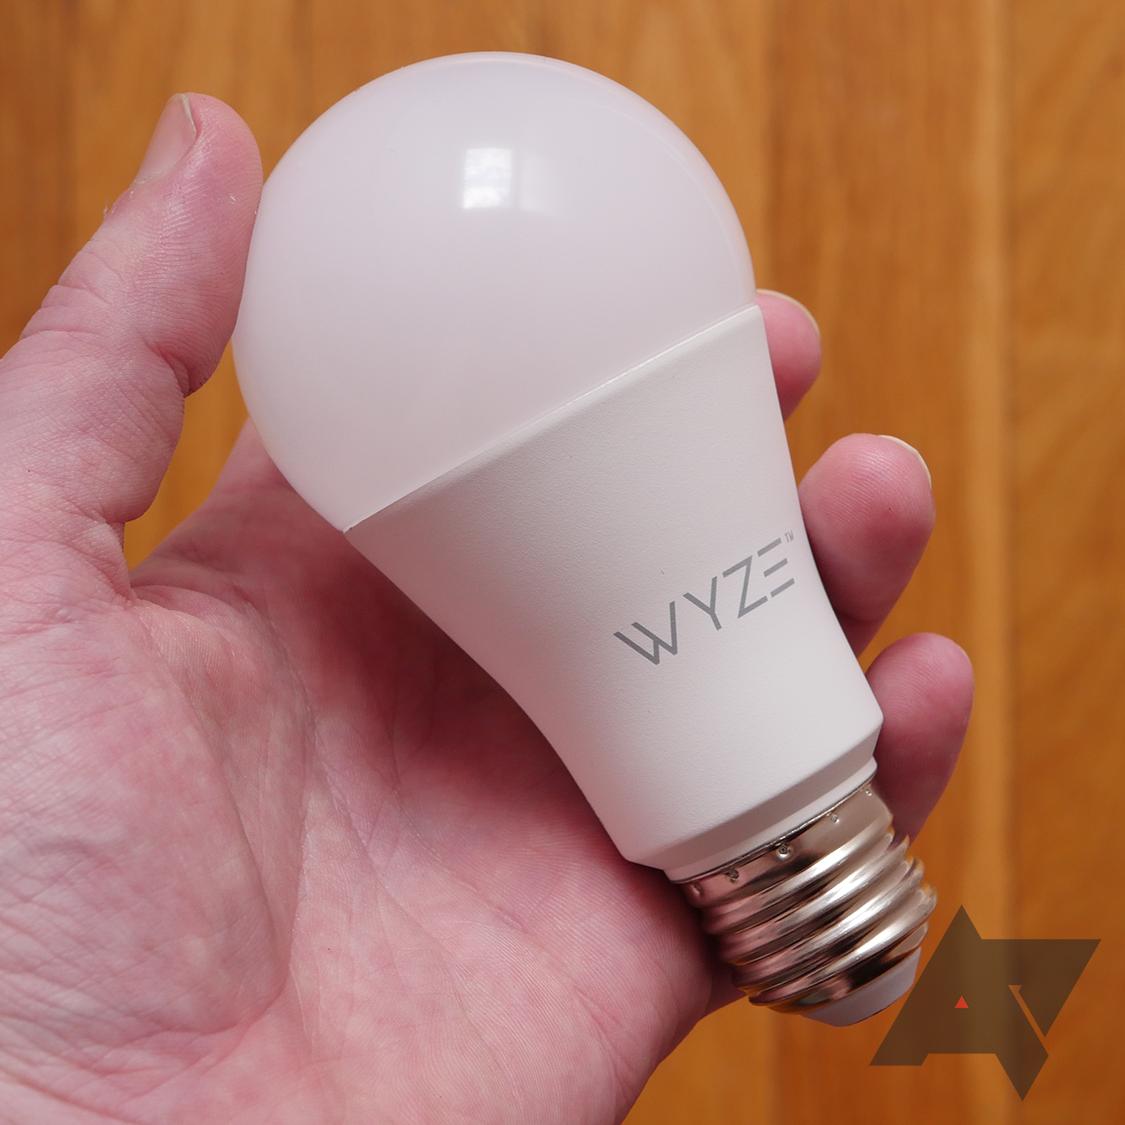 Smart Light Bulb Unresponsive